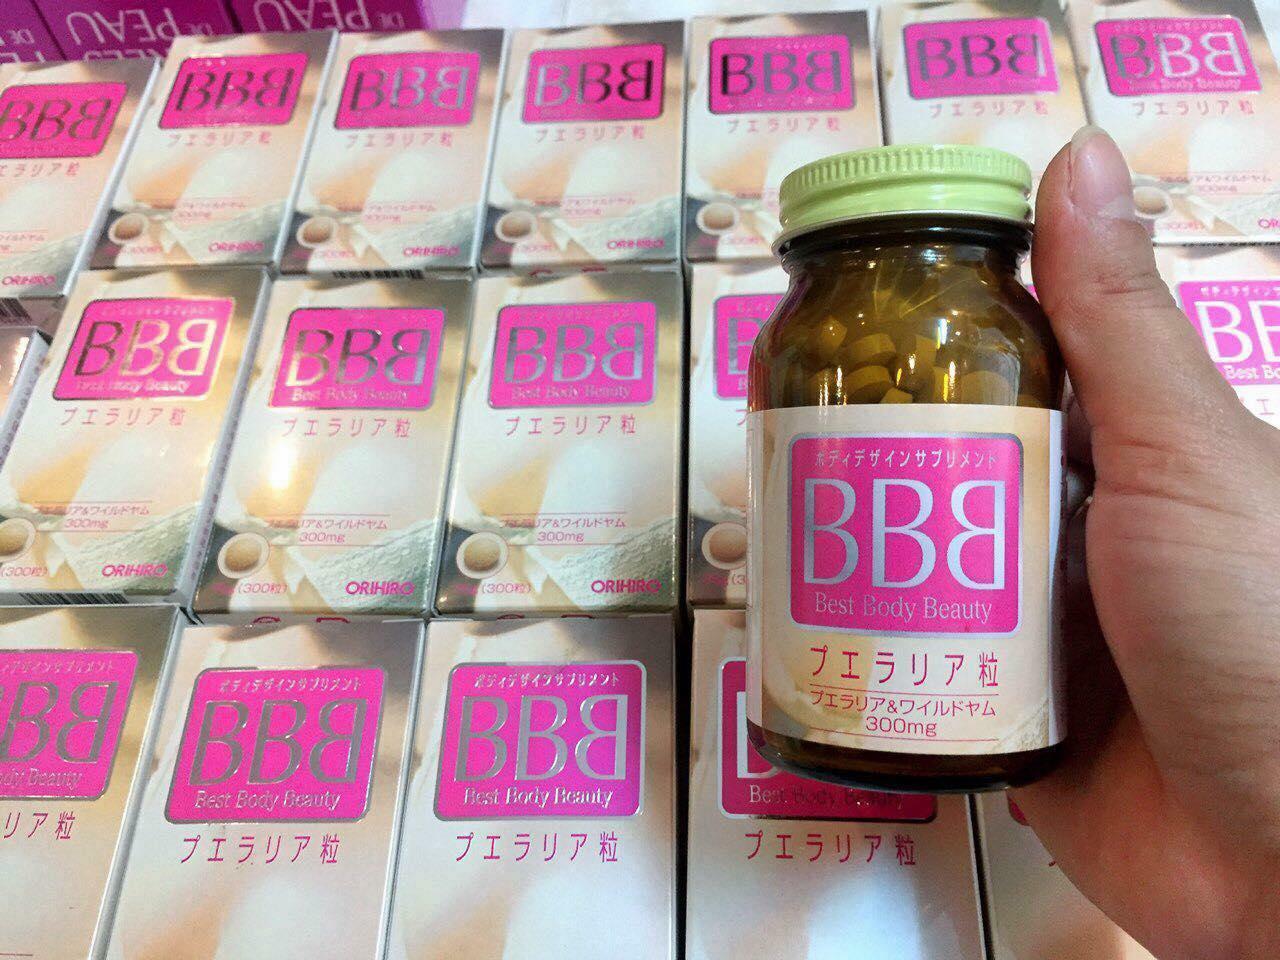 body-vien-uong-no-nguc-orihiro-best-body-beauty-bbb-hop-300-vien-nhat-ban-2711